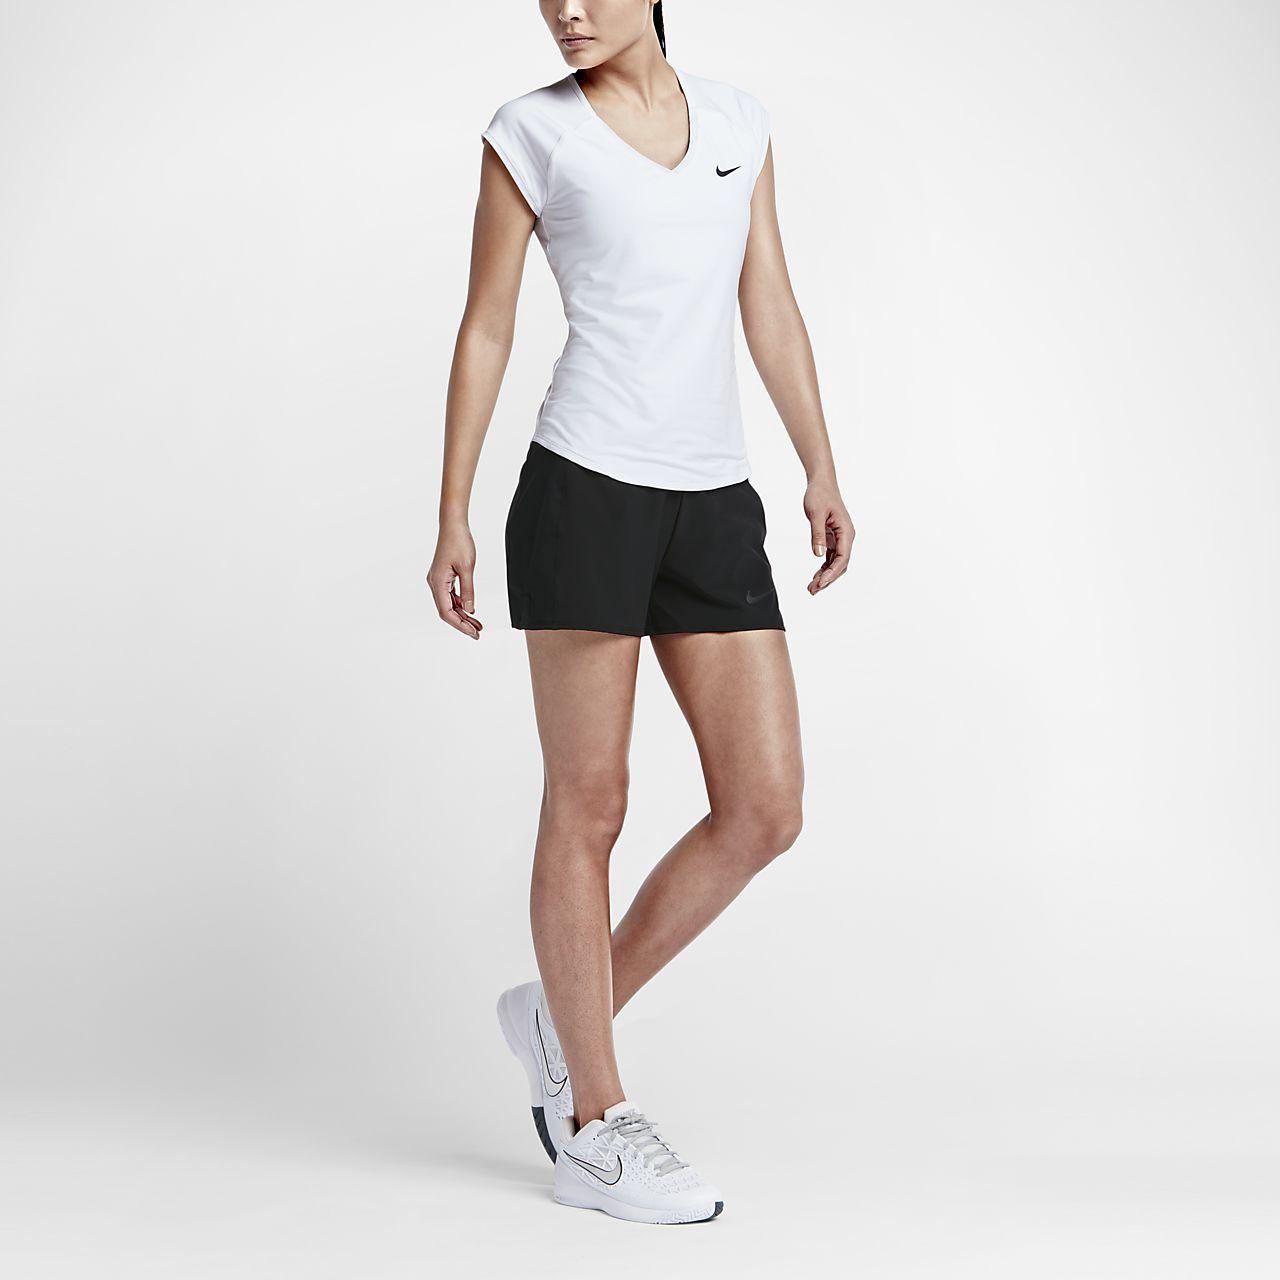 f77da118ea6 NikeCourt Pure Women's Tennis Top. Nike.com